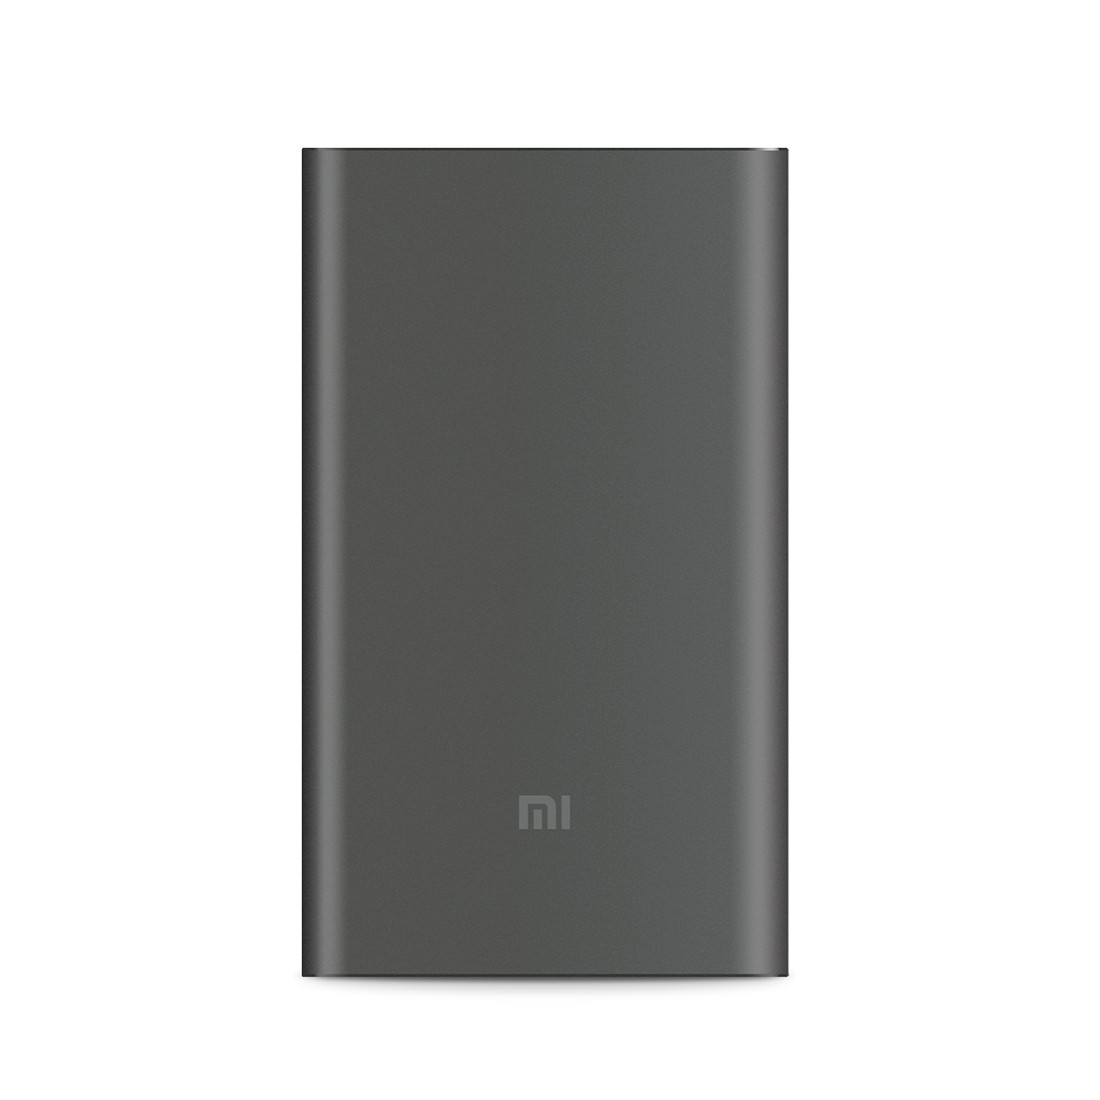 Портативное зарядное устройство, Xiaomi, Mi Power Bank 10000 mAh Pro VXN4160GL, Выход USB: 1*2.1A, И